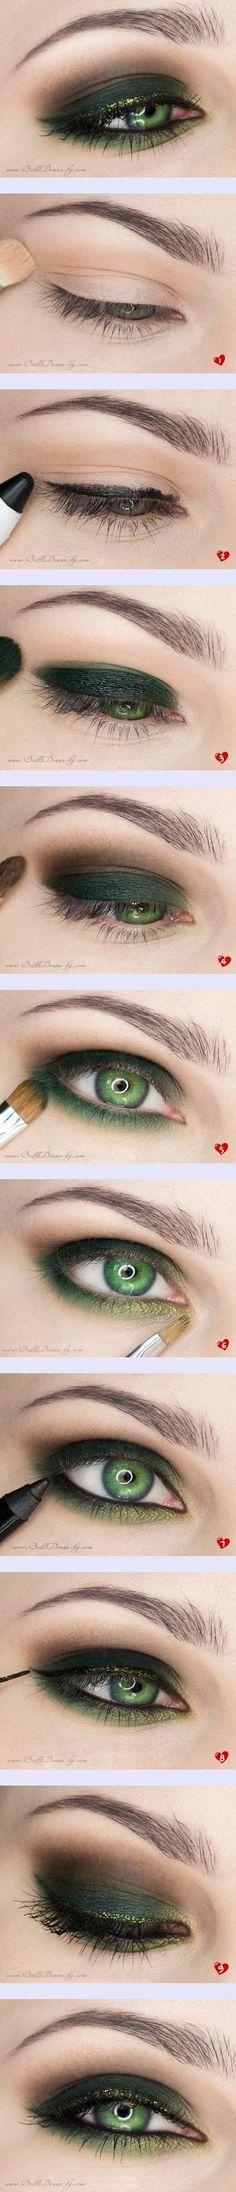 Beautiful Green Eye Shadow with a Pretty Eyeliner - Eye Make Up Tutorial